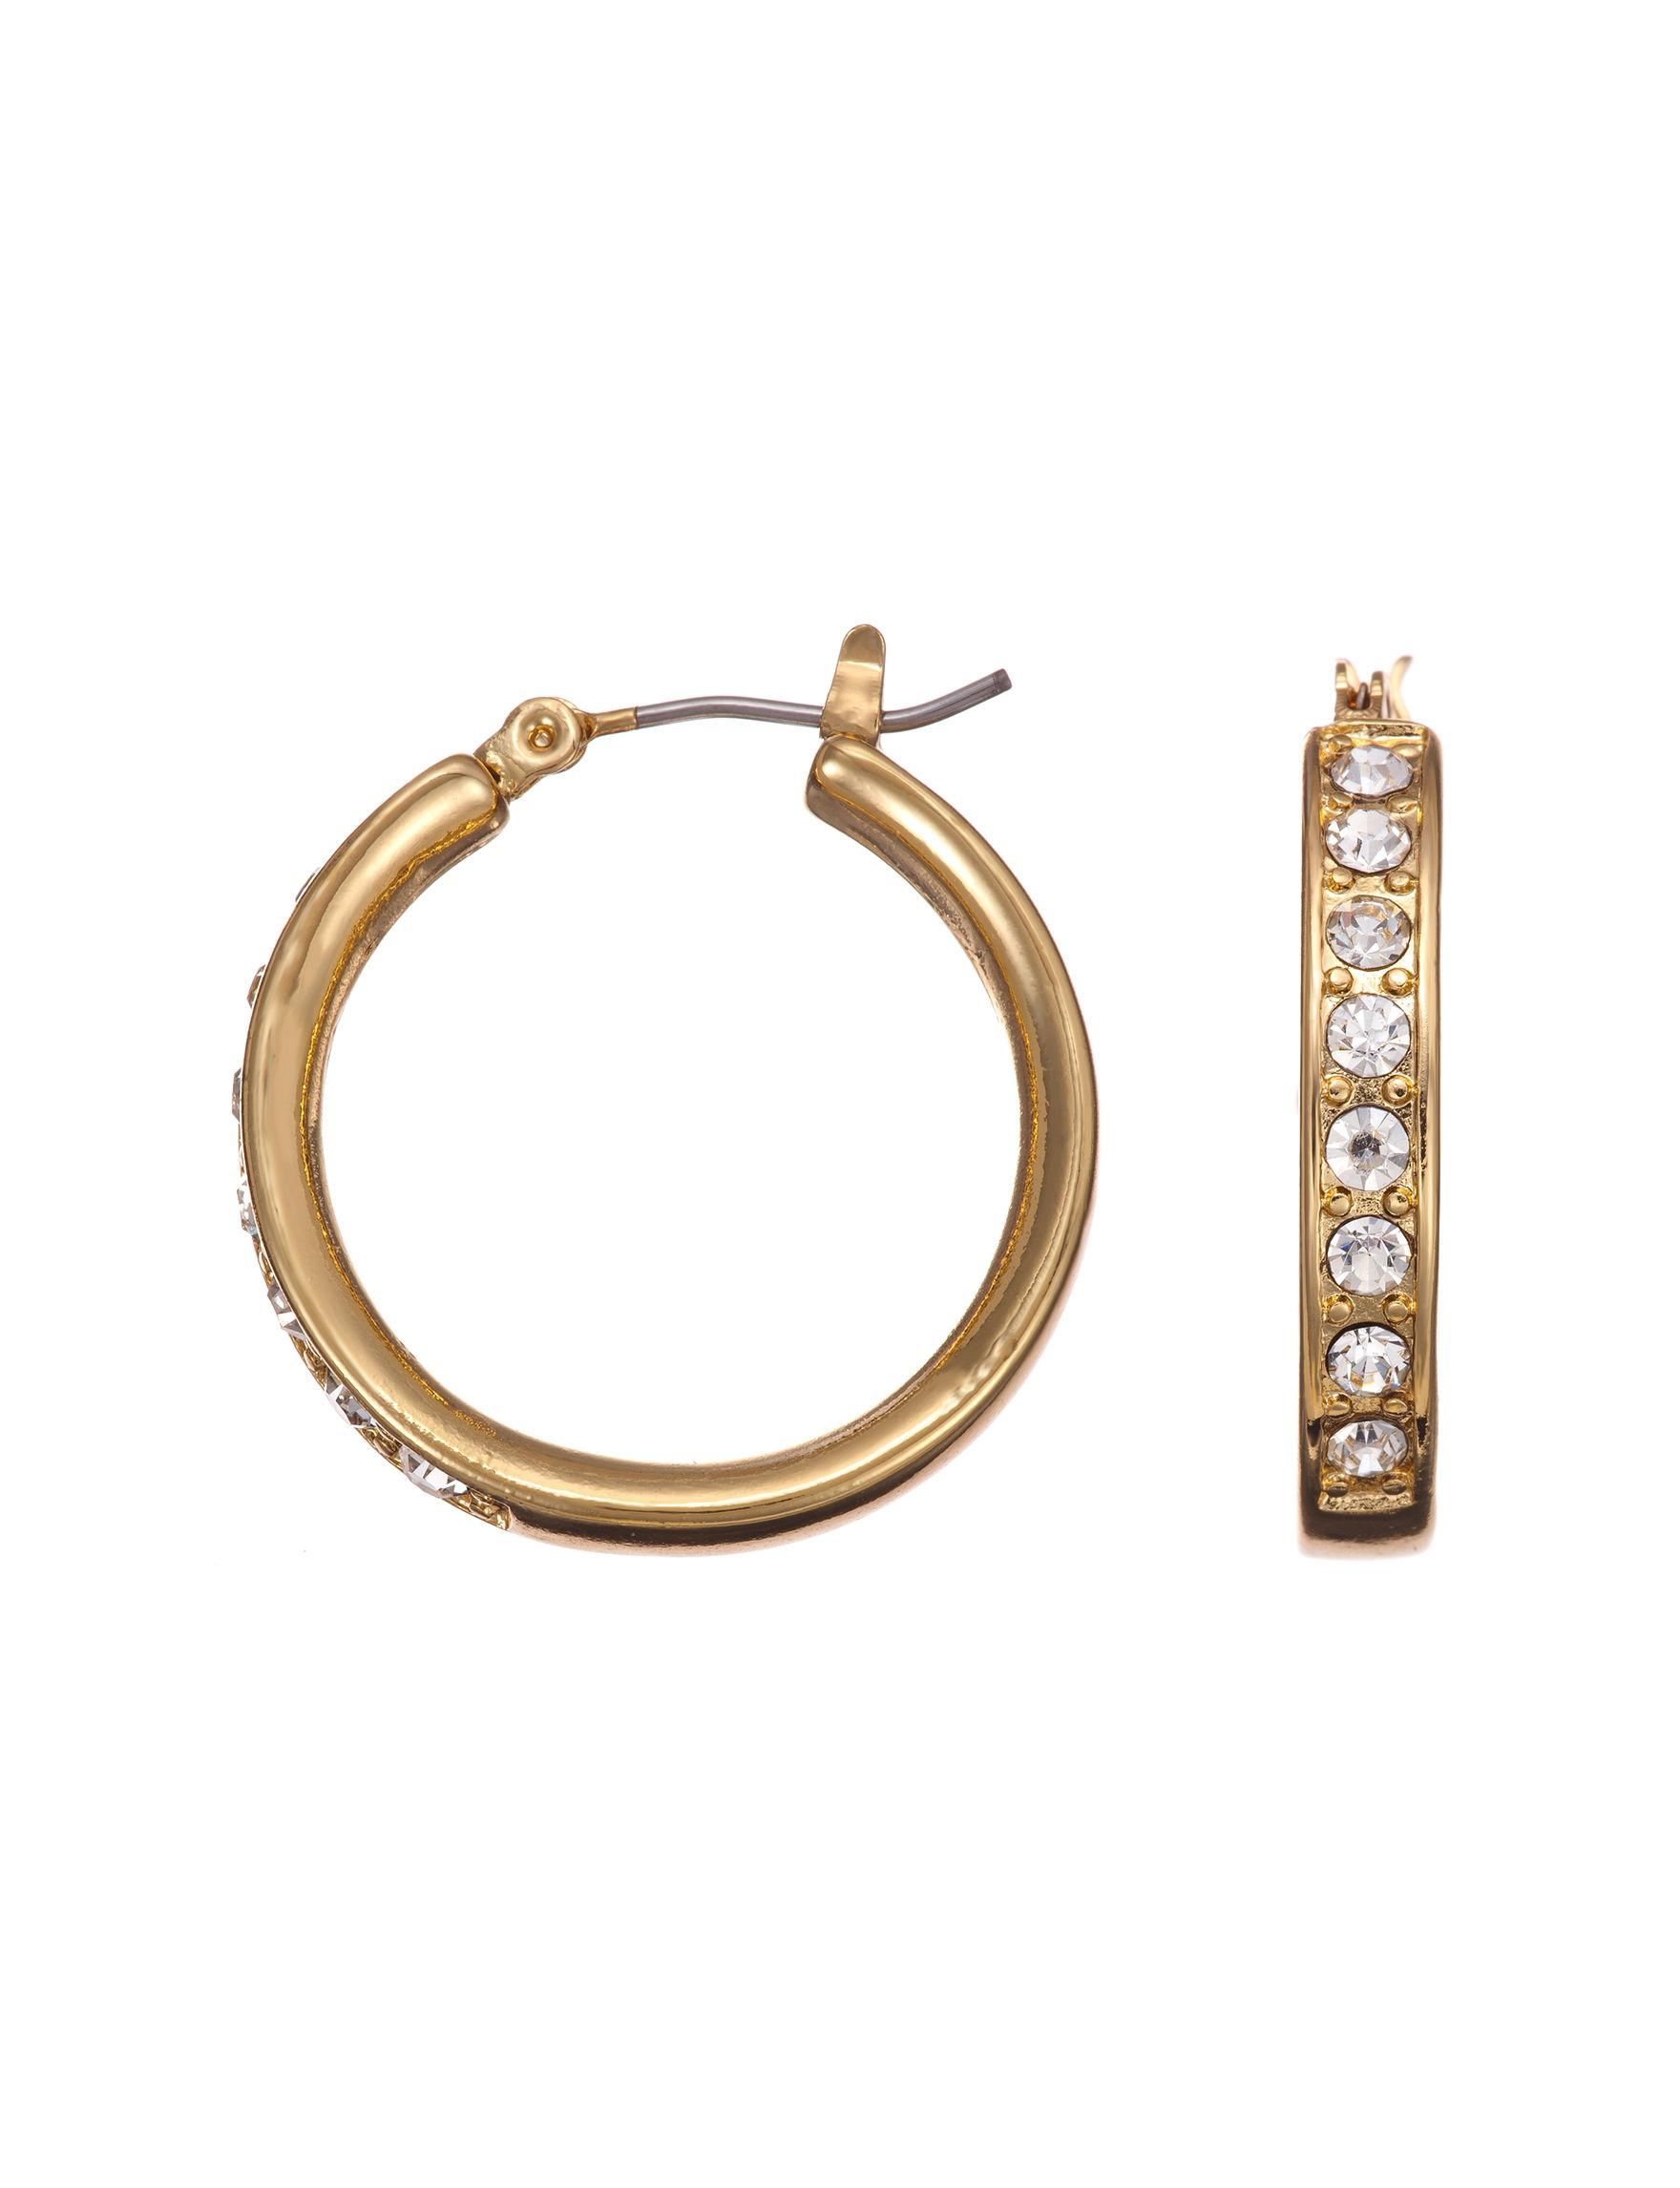 Via Roma Gold / Crystal Hoops Earrings Fashion Jewelry